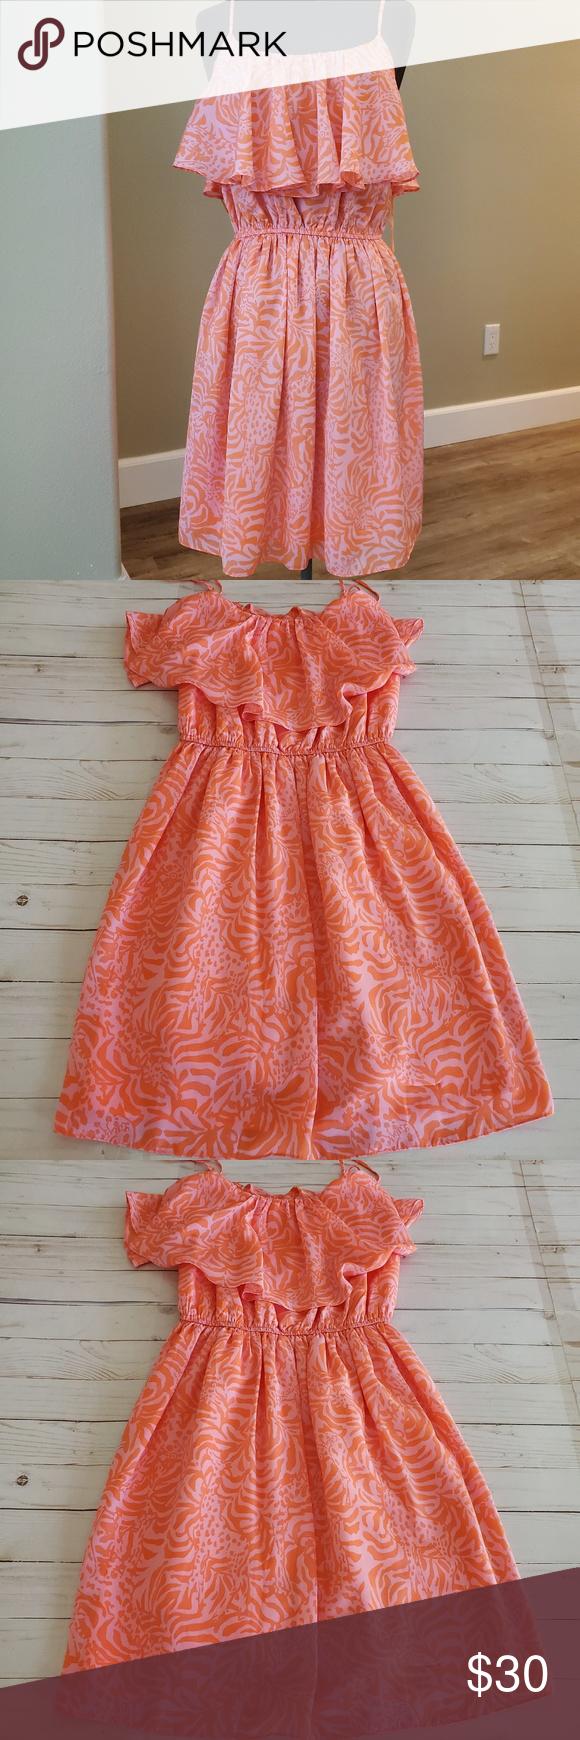 Lilly Pulitzer For Target Jungle Orange Dress Orange Dress Clothes Design Dresses [ 1740 x 580 Pixel ]